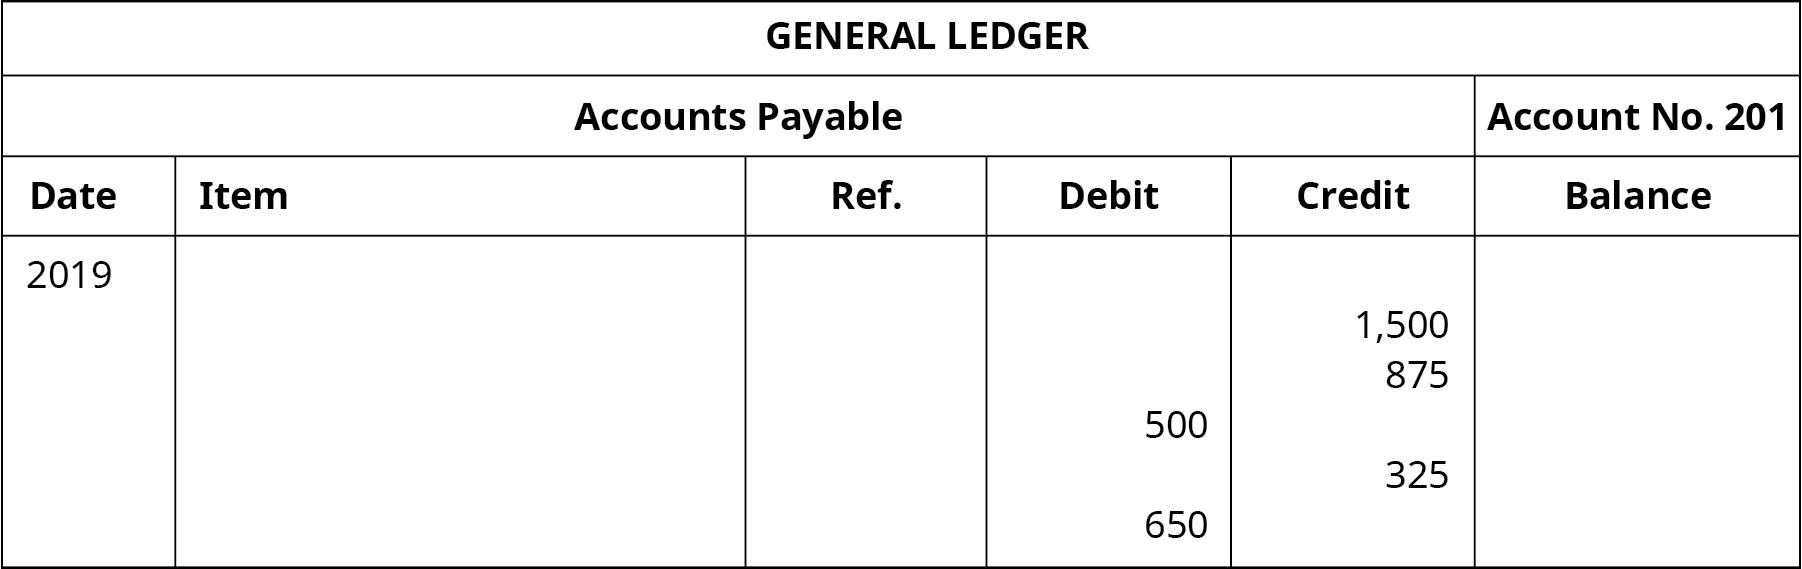 "A General Ledger titled ""Accounts Payable No. 201"" with six columns. Date: 2019. Debit column entries: 500, 650. Credit column entries: 1,500, 875, 325."